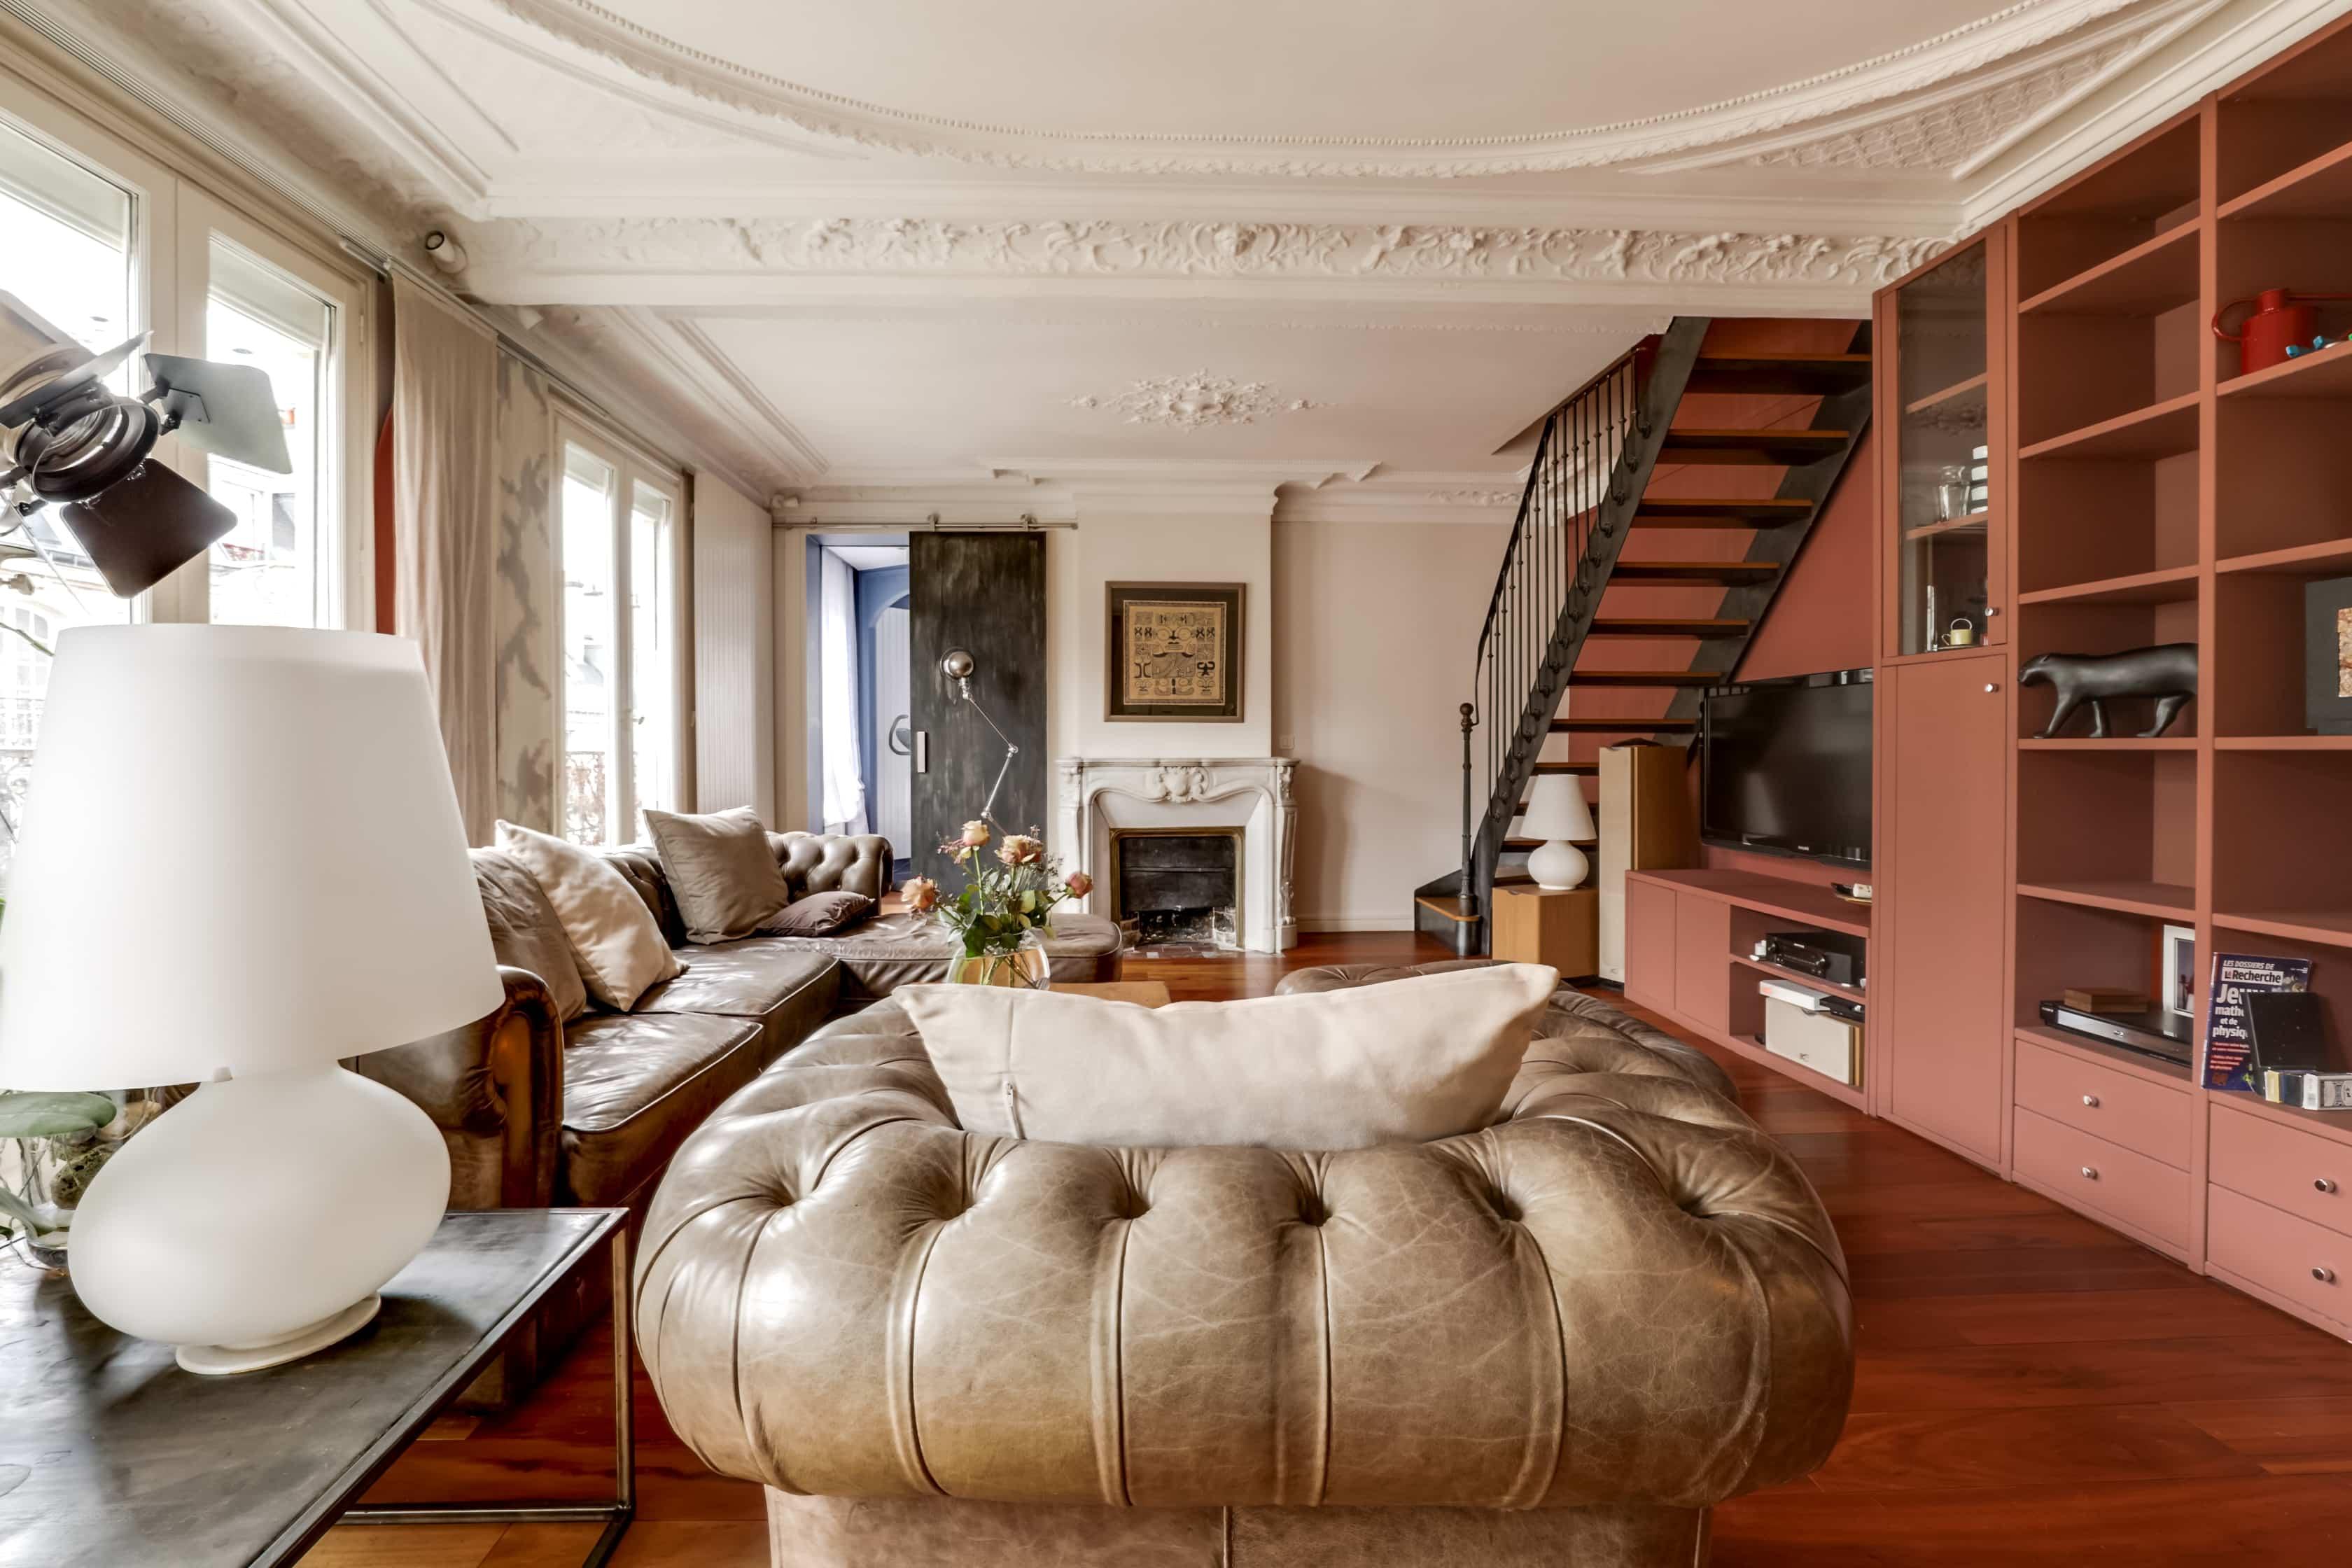 condorcet meero 2003 paris property group. Black Bedroom Furniture Sets. Home Design Ideas